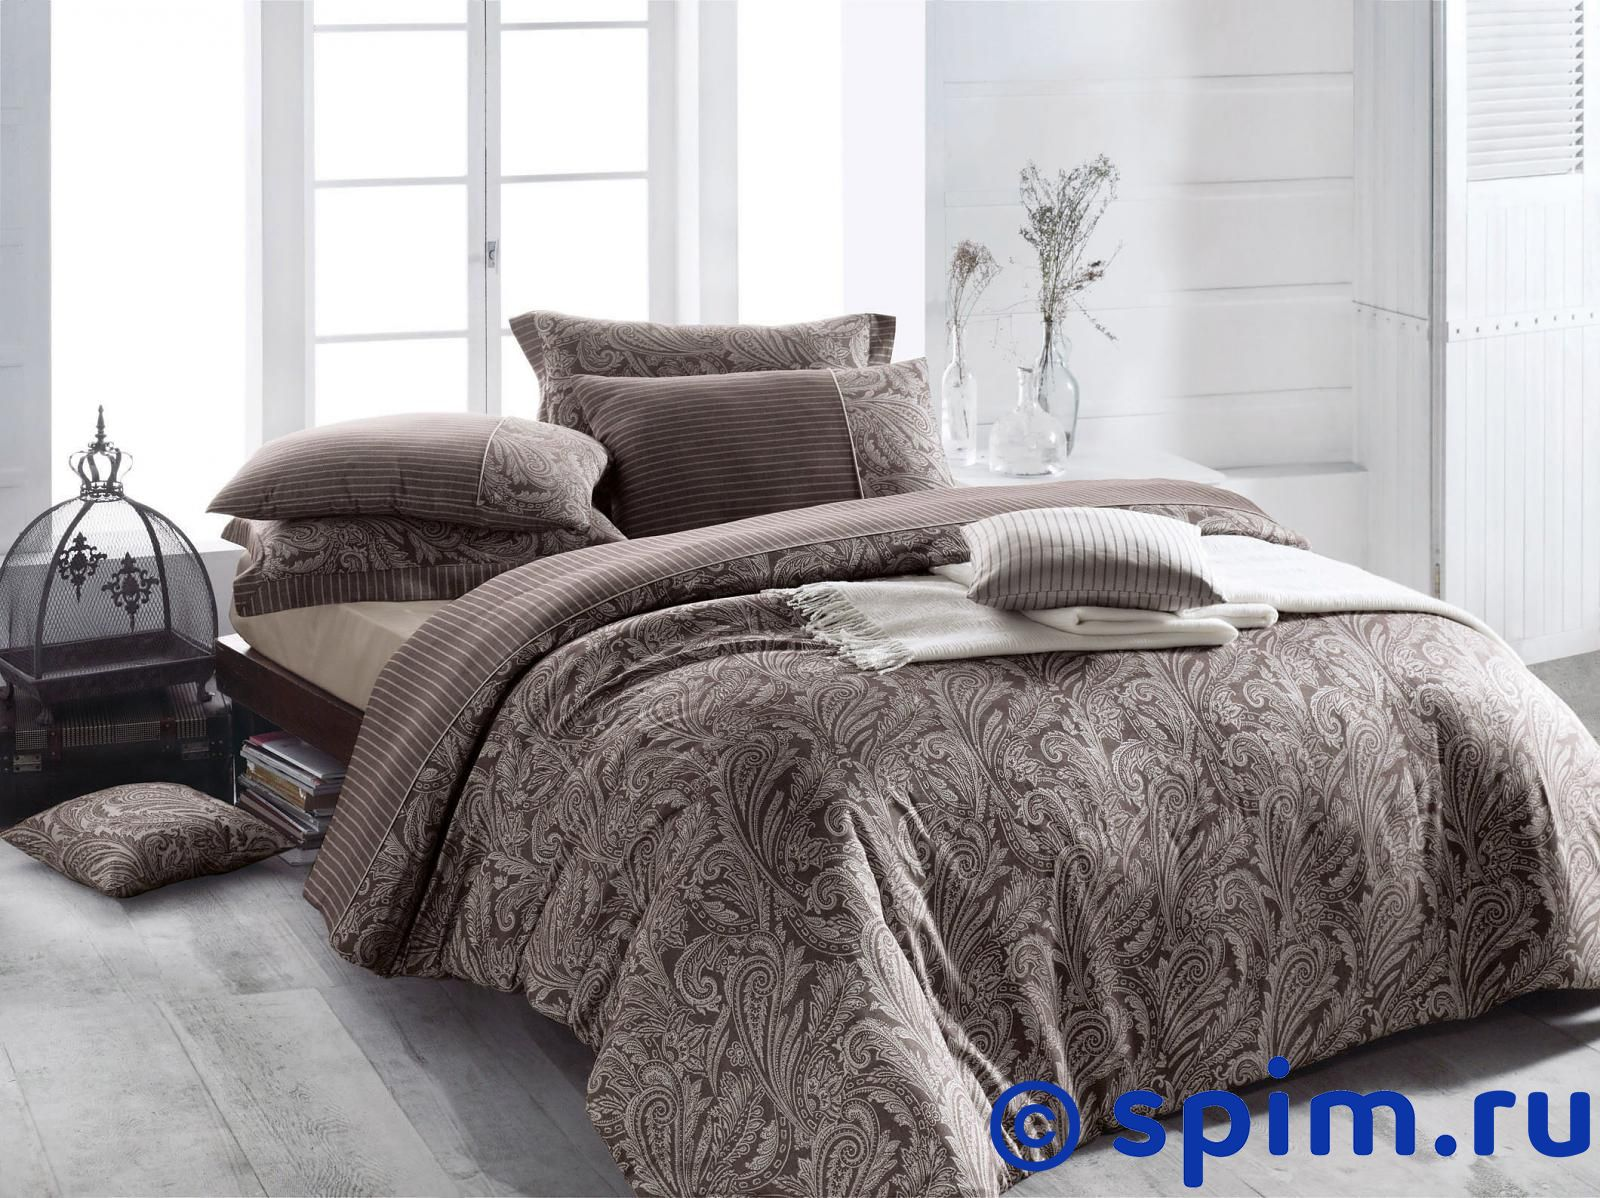 Постельное белье Issimo Sheridan Евро-стандарт постельное белье issimo soho евро стандарт